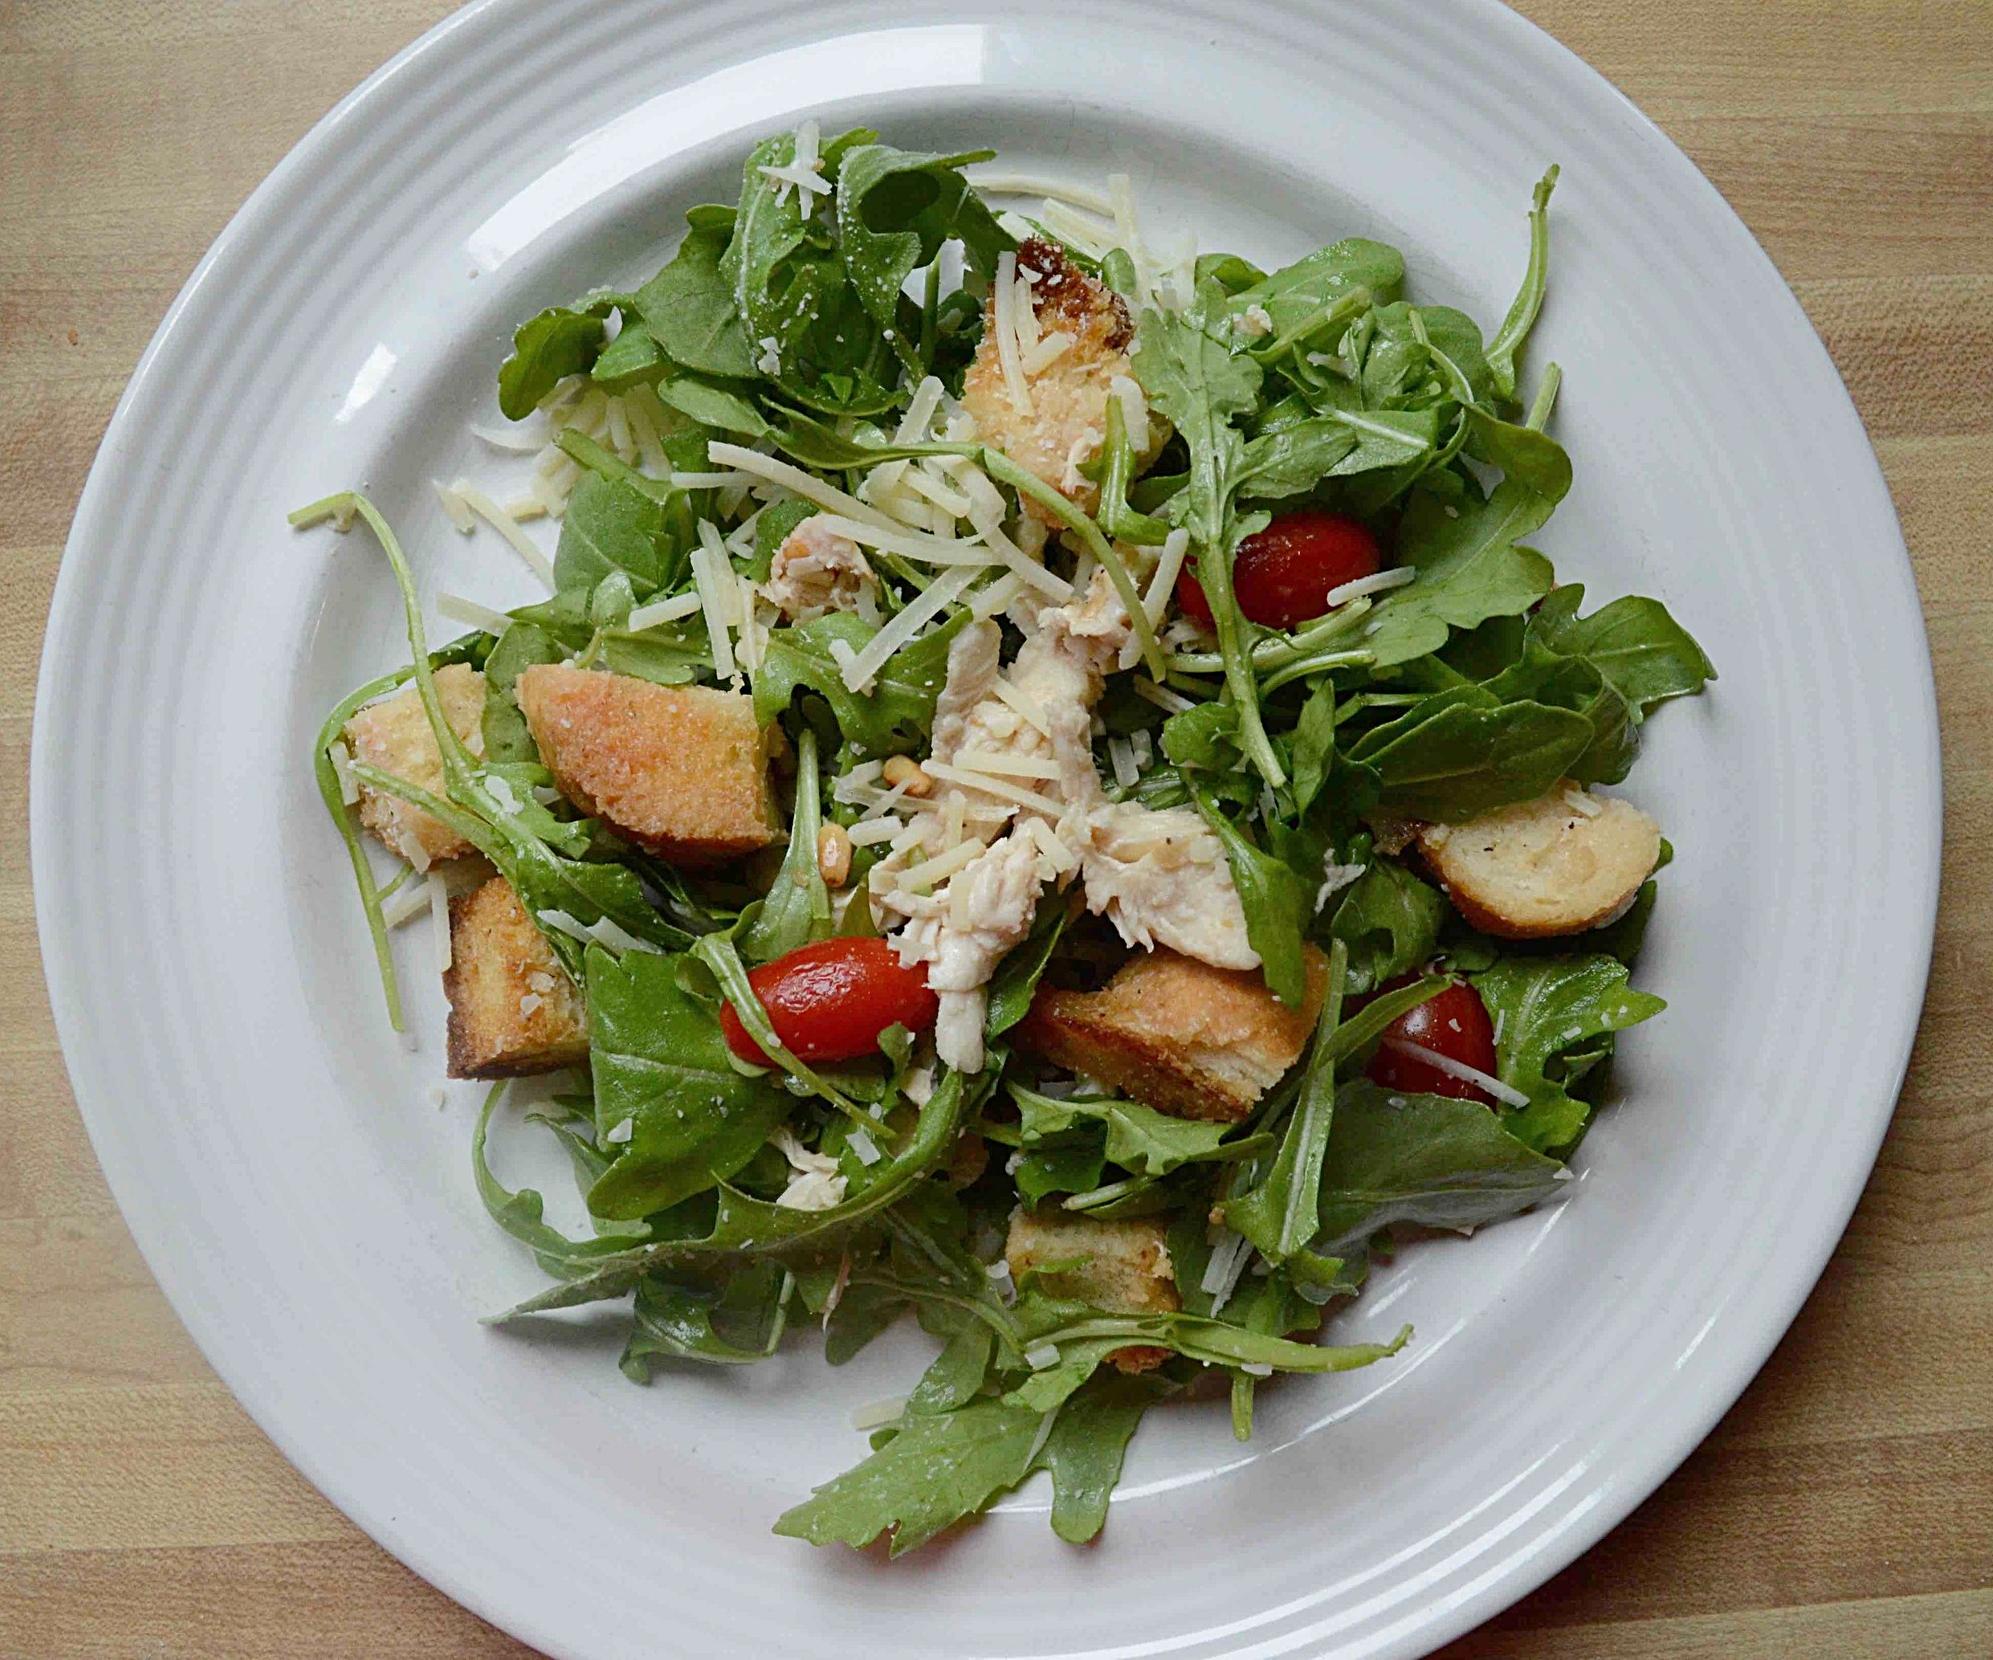 Warm Roasted Chicken and Arugula Bread Salad